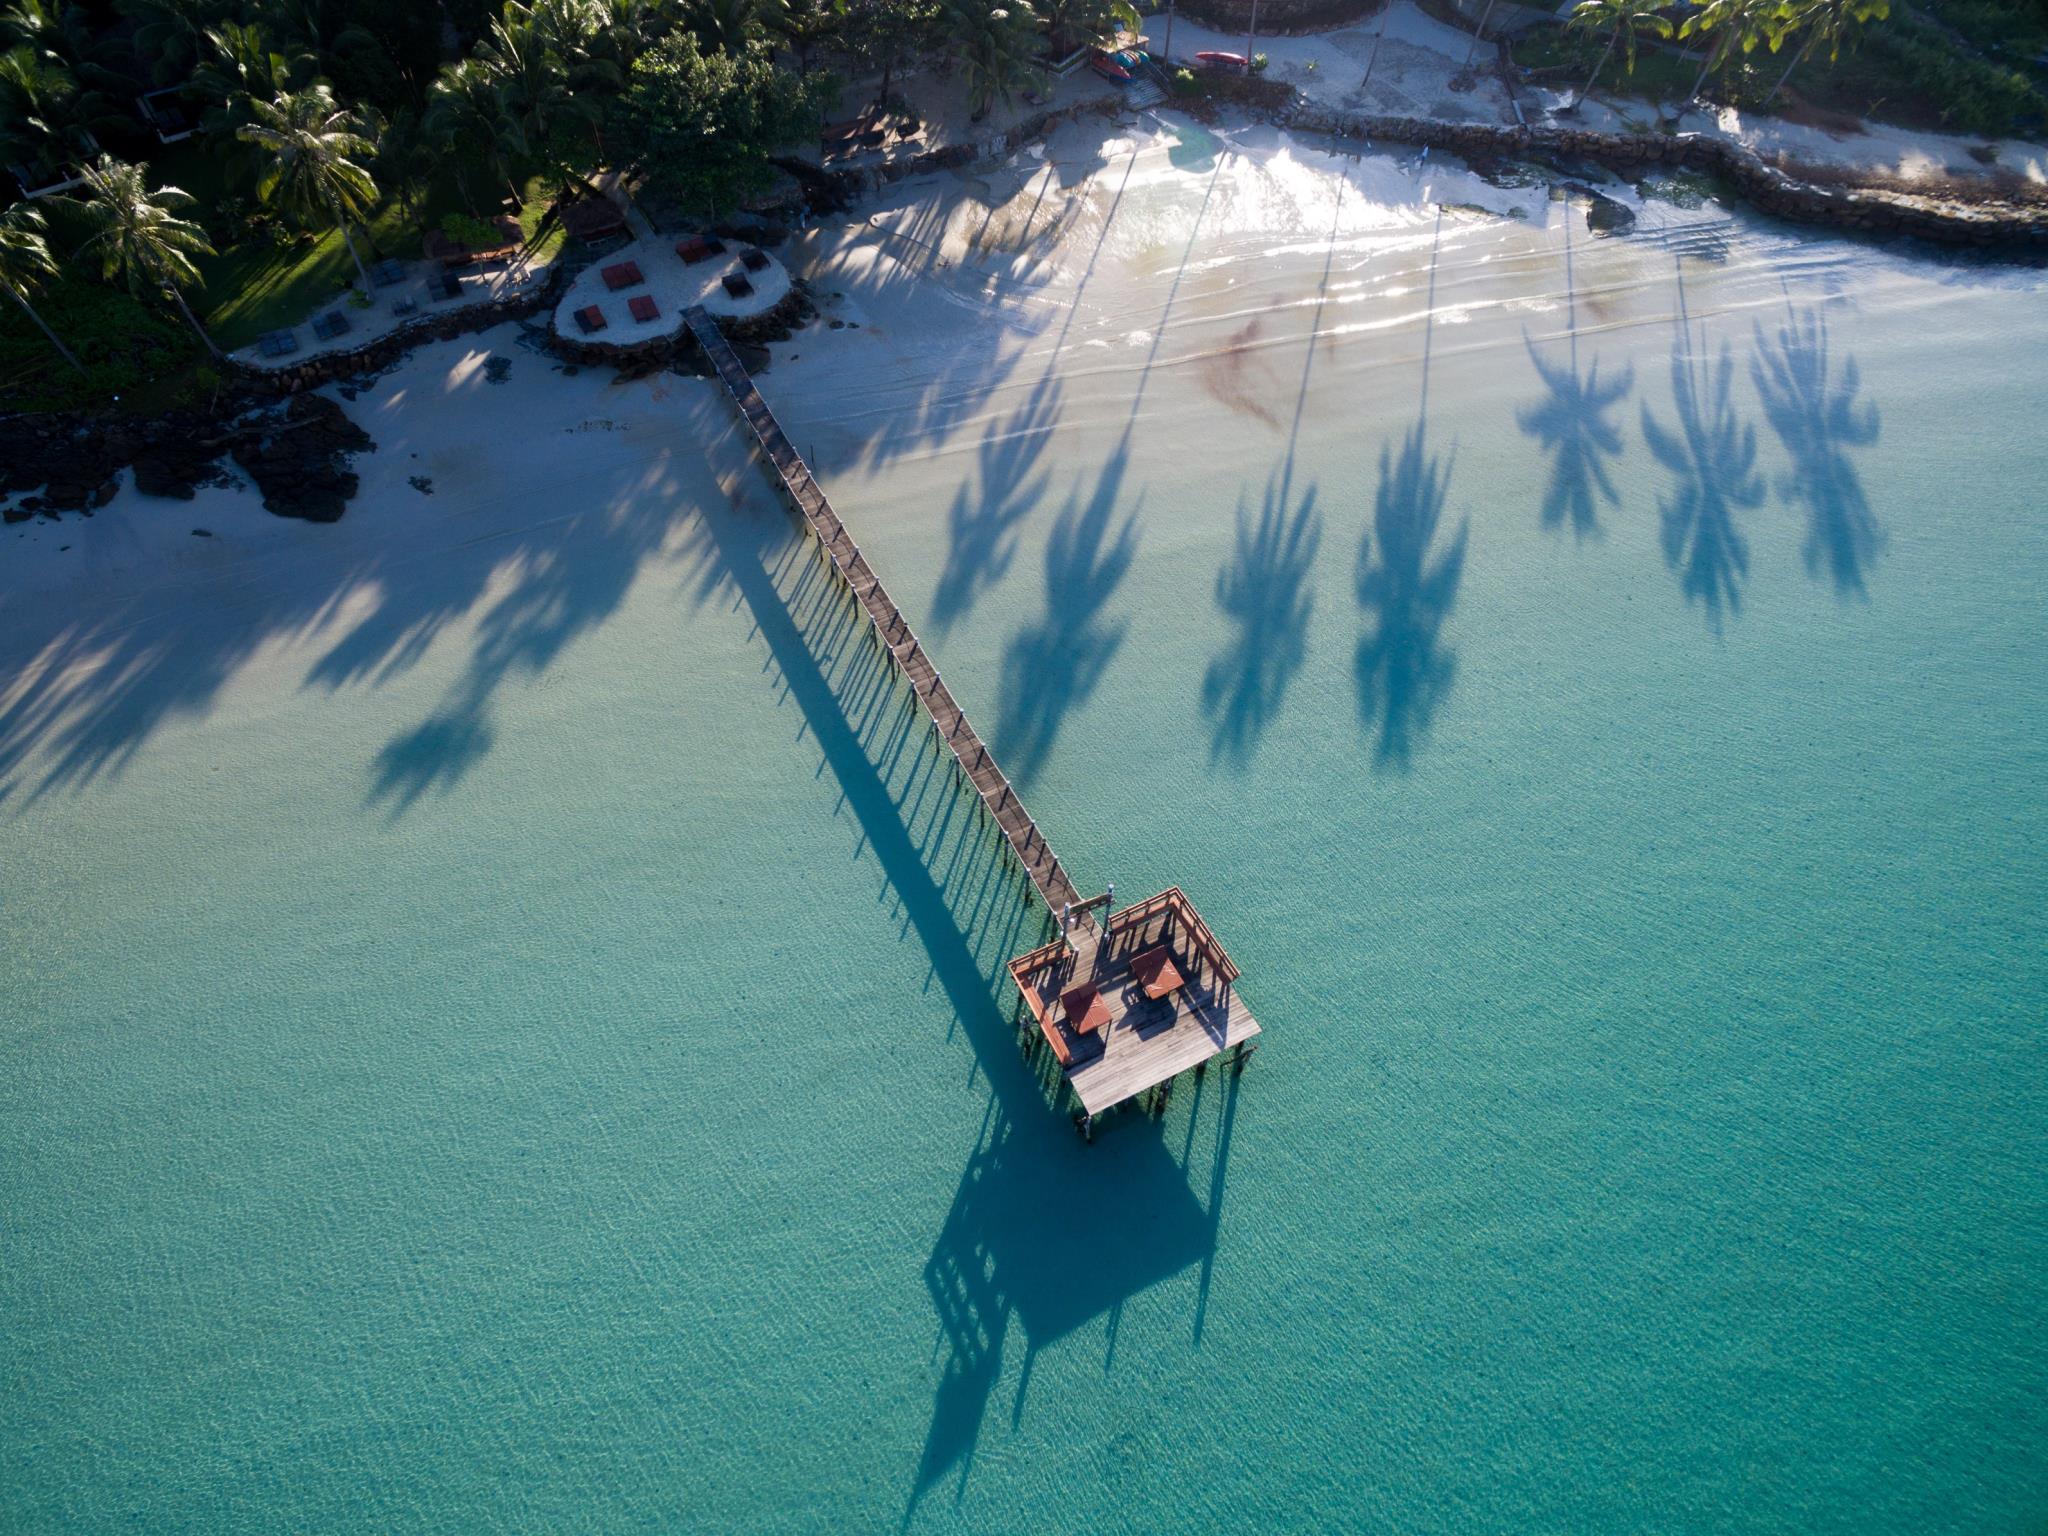 The Beach Natural Resort Koh Kood เดอะ บีช เนเชอรัล รีสอร์ท เกาะกูด